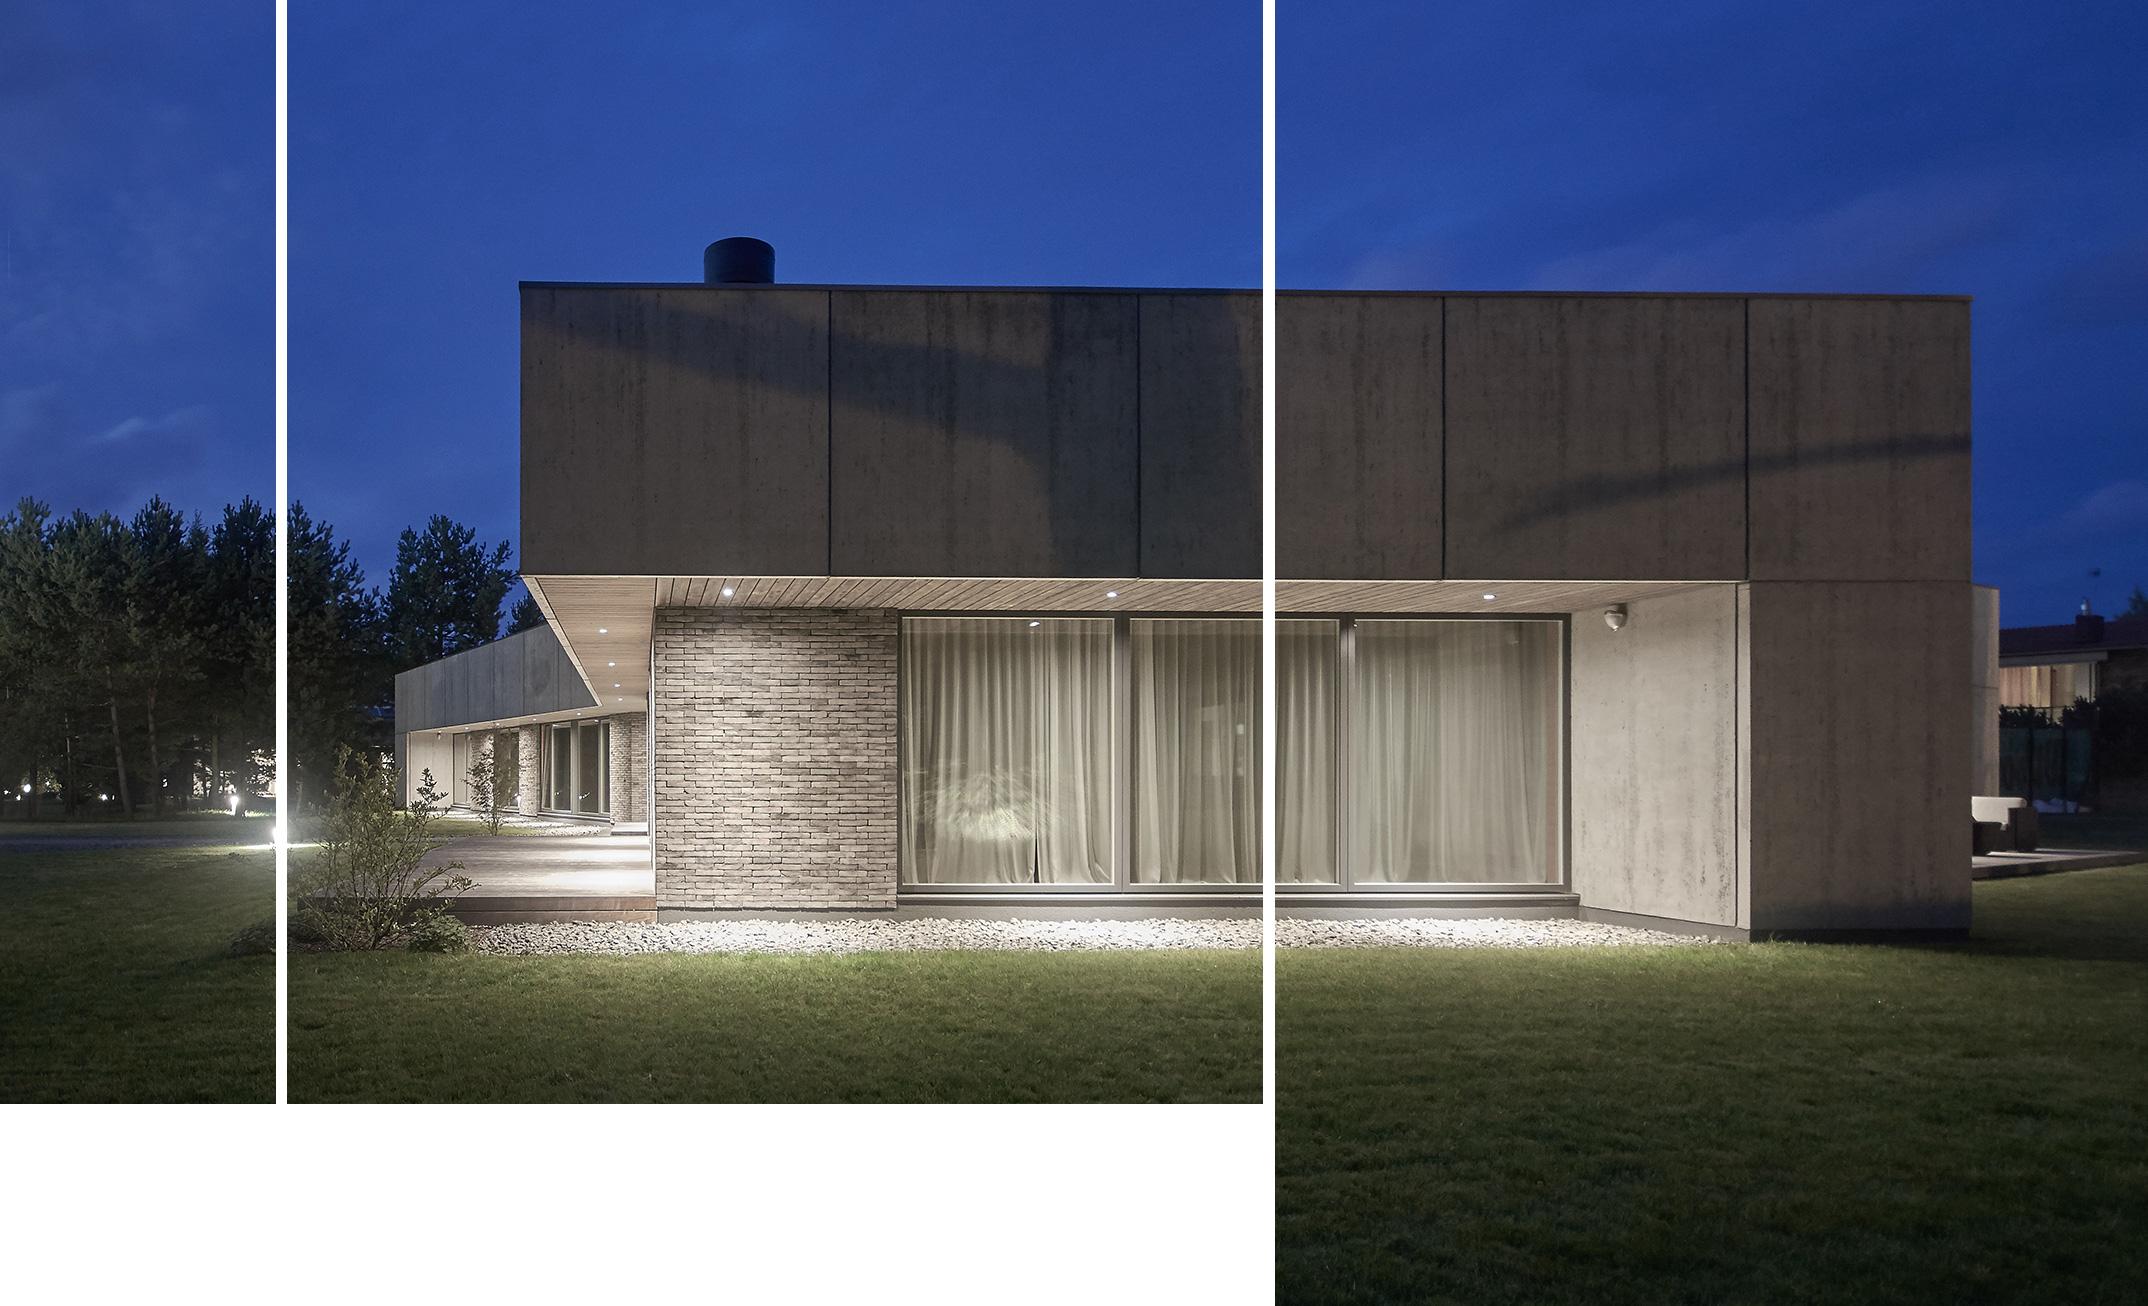 EJtekstile–-interjero-tekstiles-projektavimo-studija--Interior-textile-design-studio-1